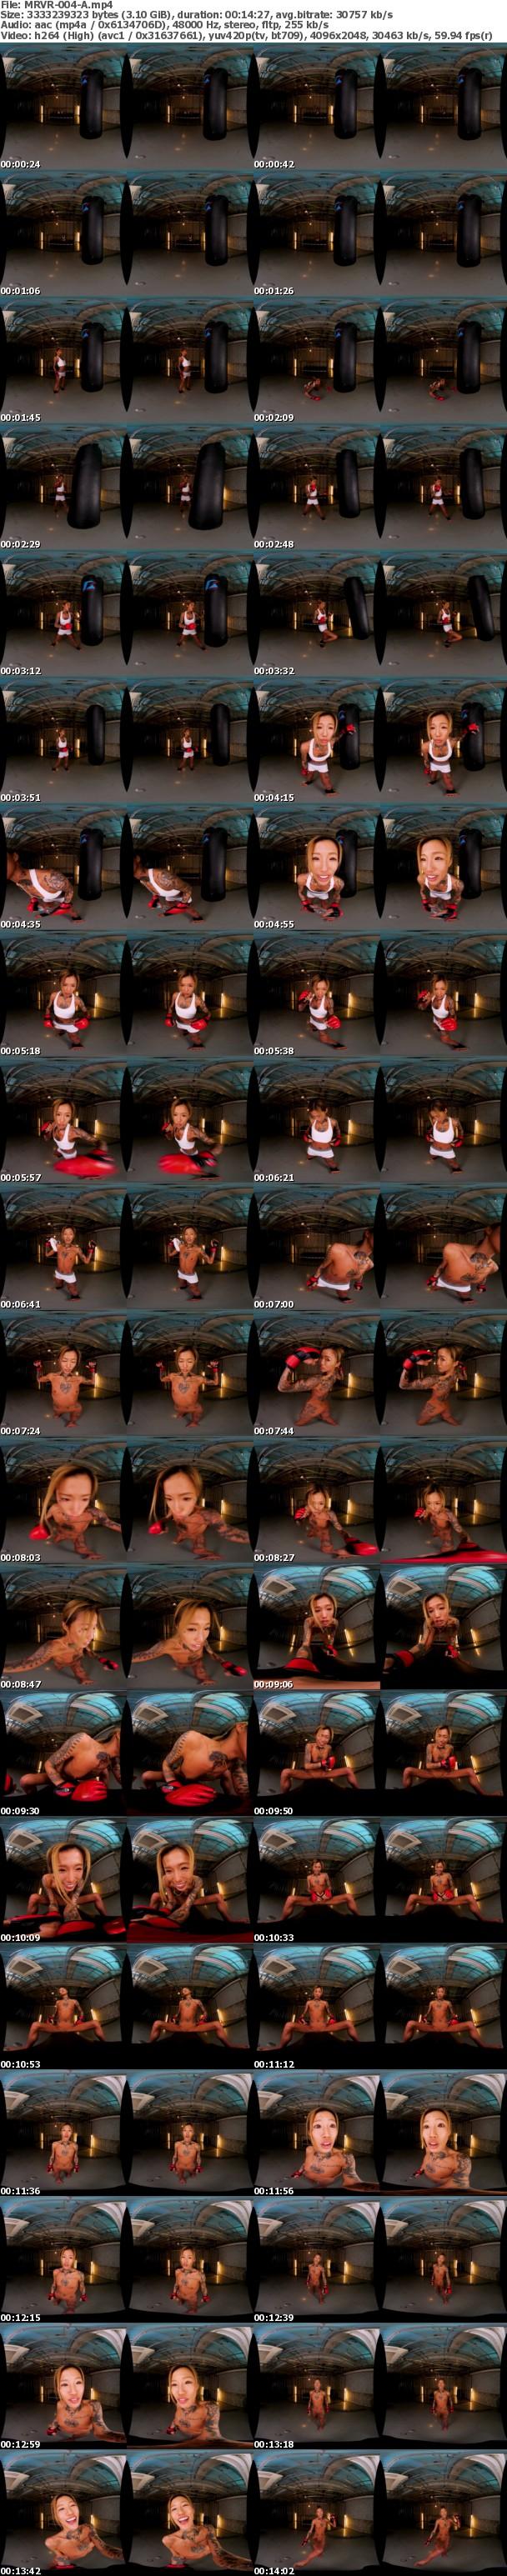 (VR) MRVR-004 黒ギャル格闘家の暴力的射精管理でM男が再起不能になるまで逆レ●プ:3ラウンド 鮫島るい